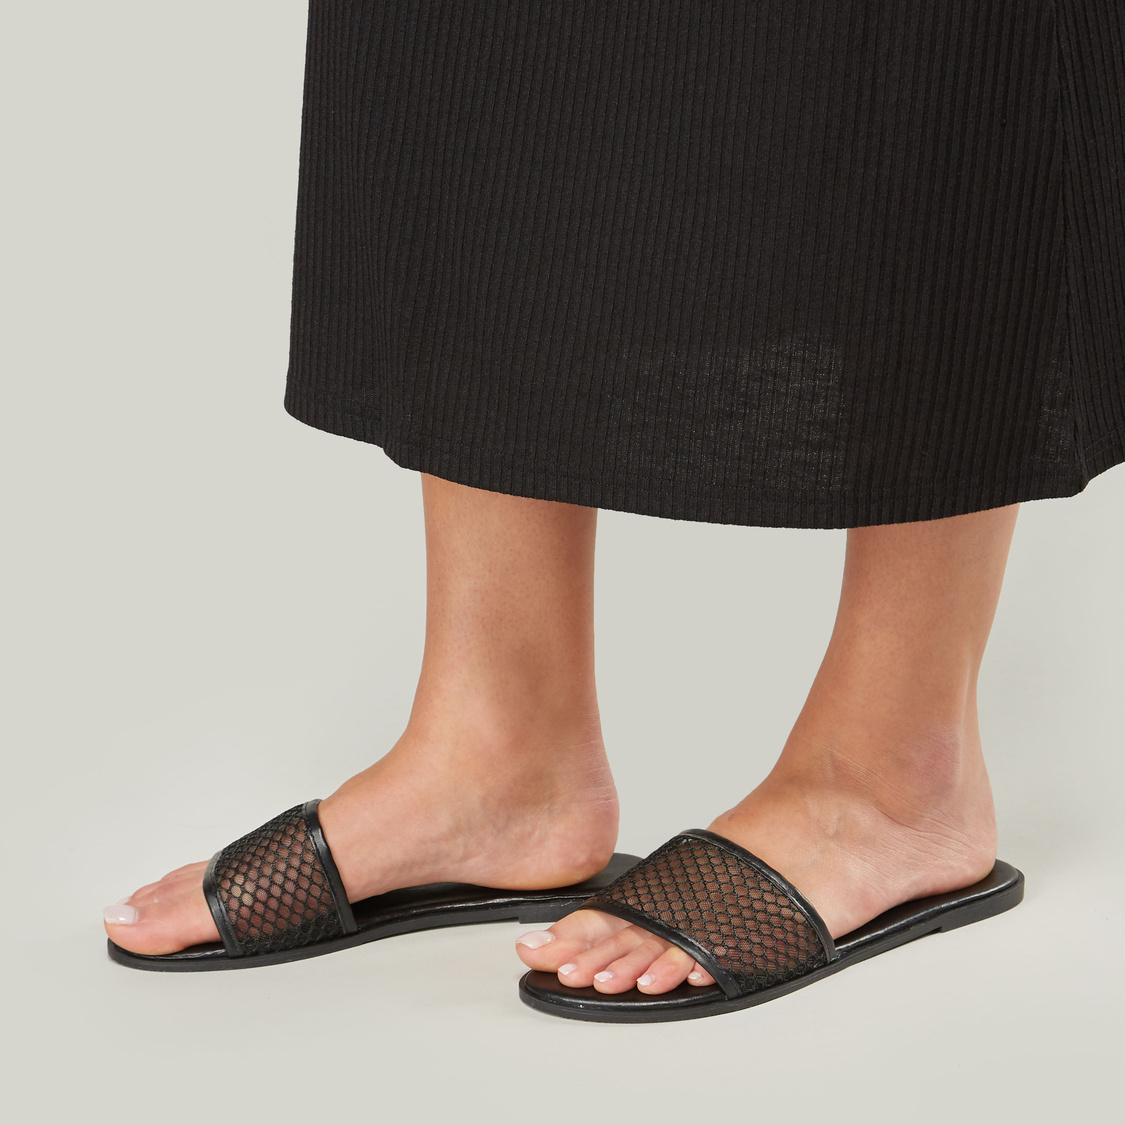 Flat Heel Slides with Textured Strap